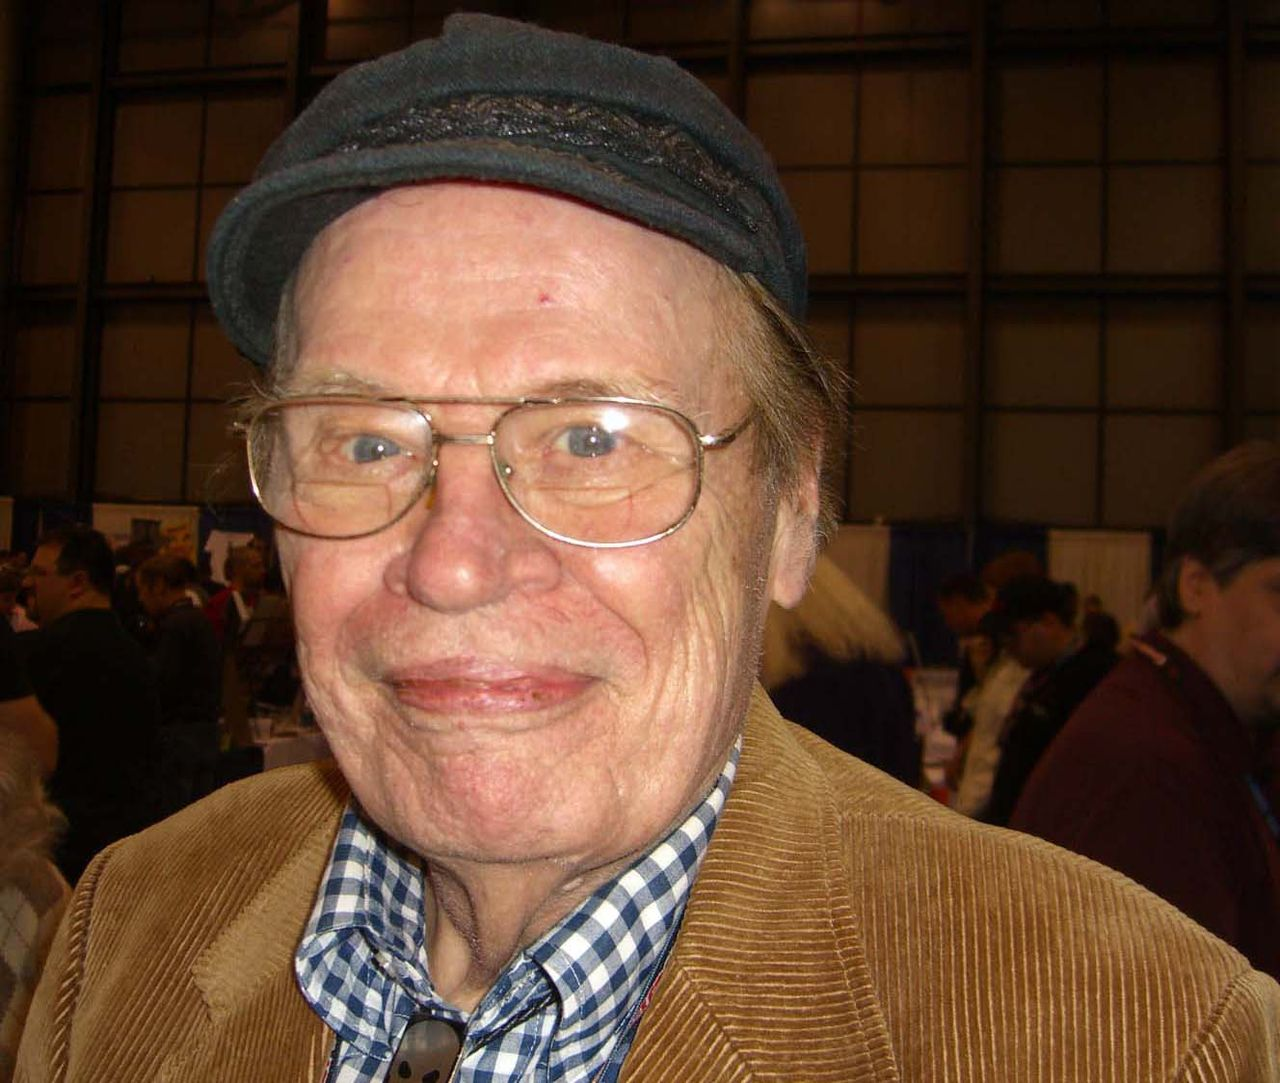 Dick Ayers in April of 2008.